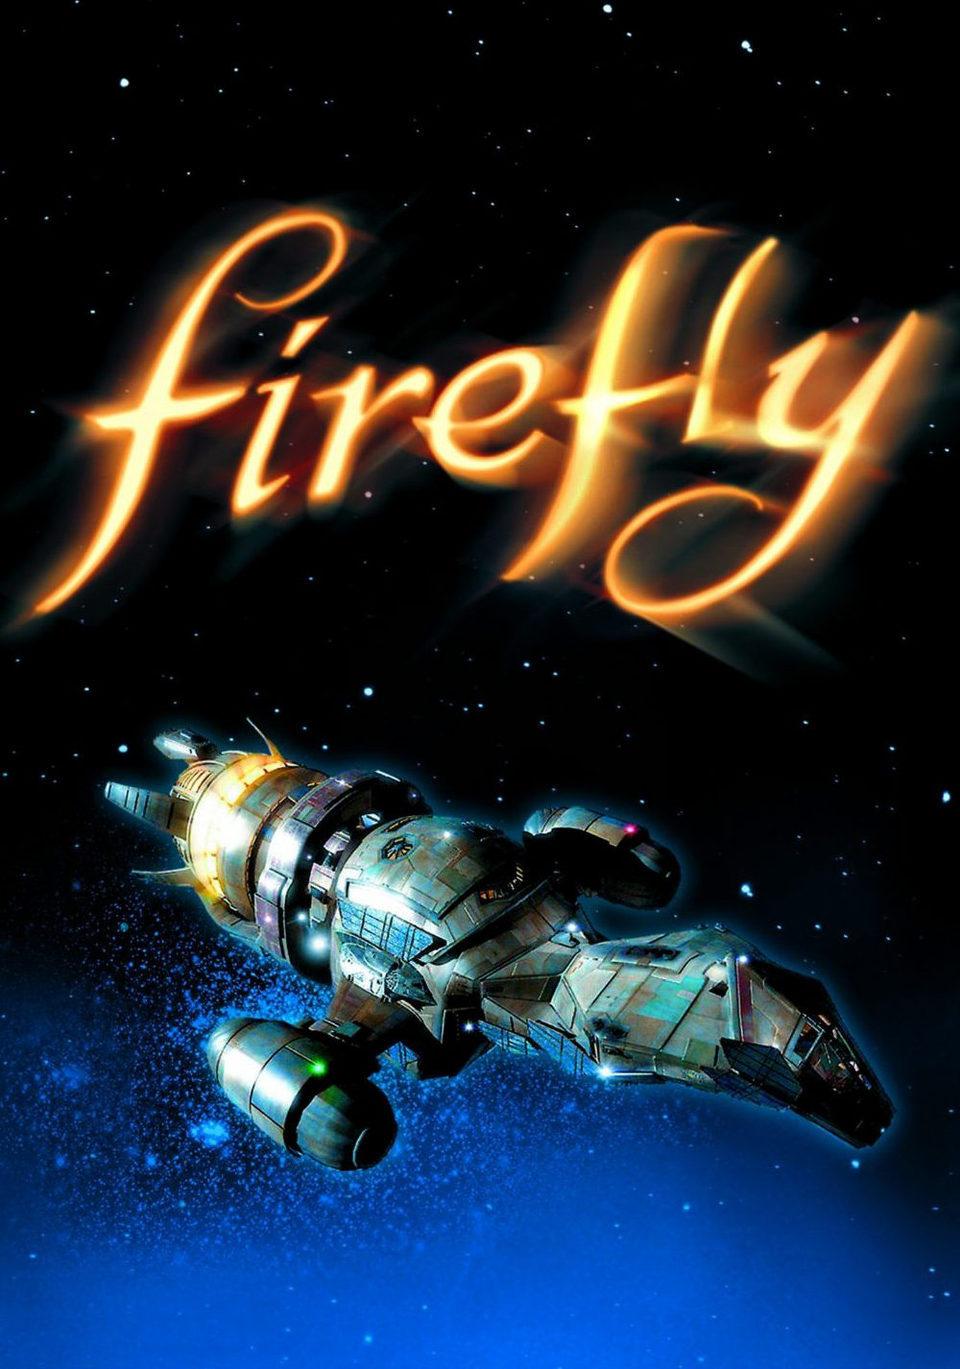 'Firefly' #1 poster for Firefly